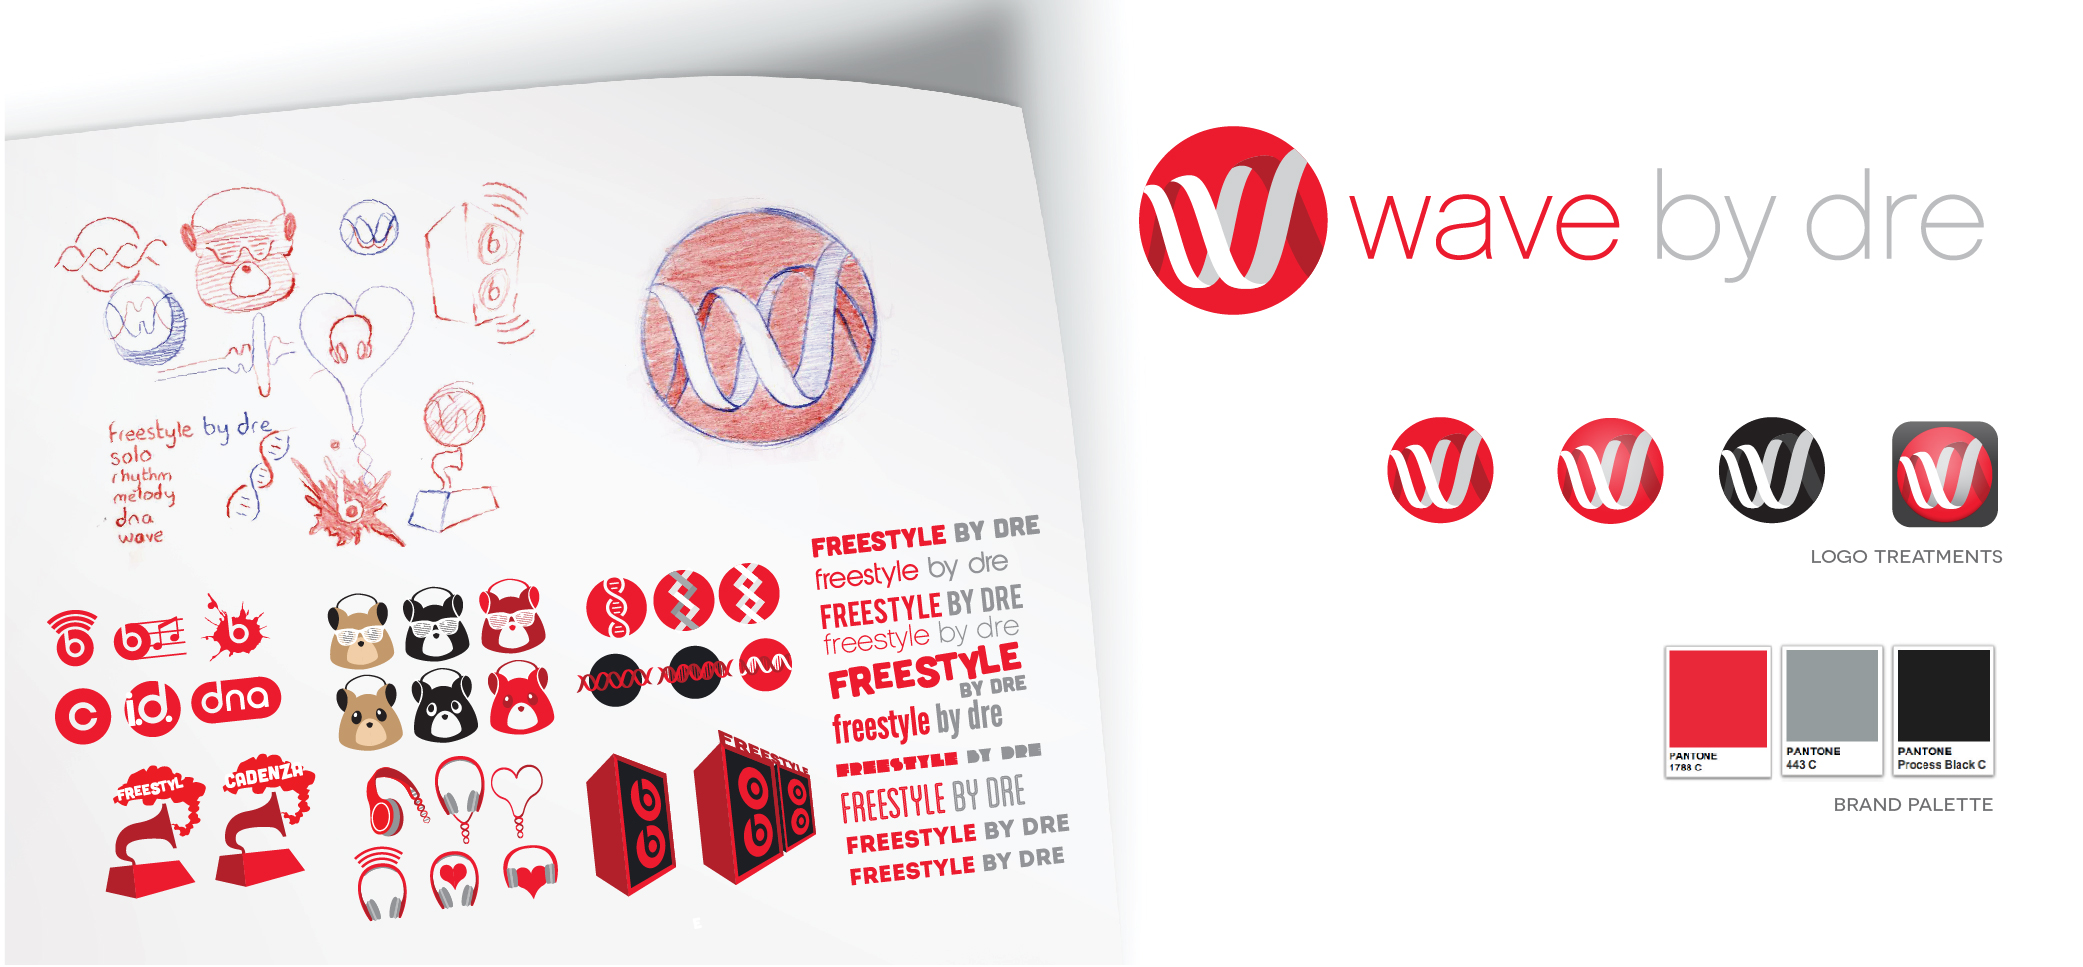 webslides-03.jpg